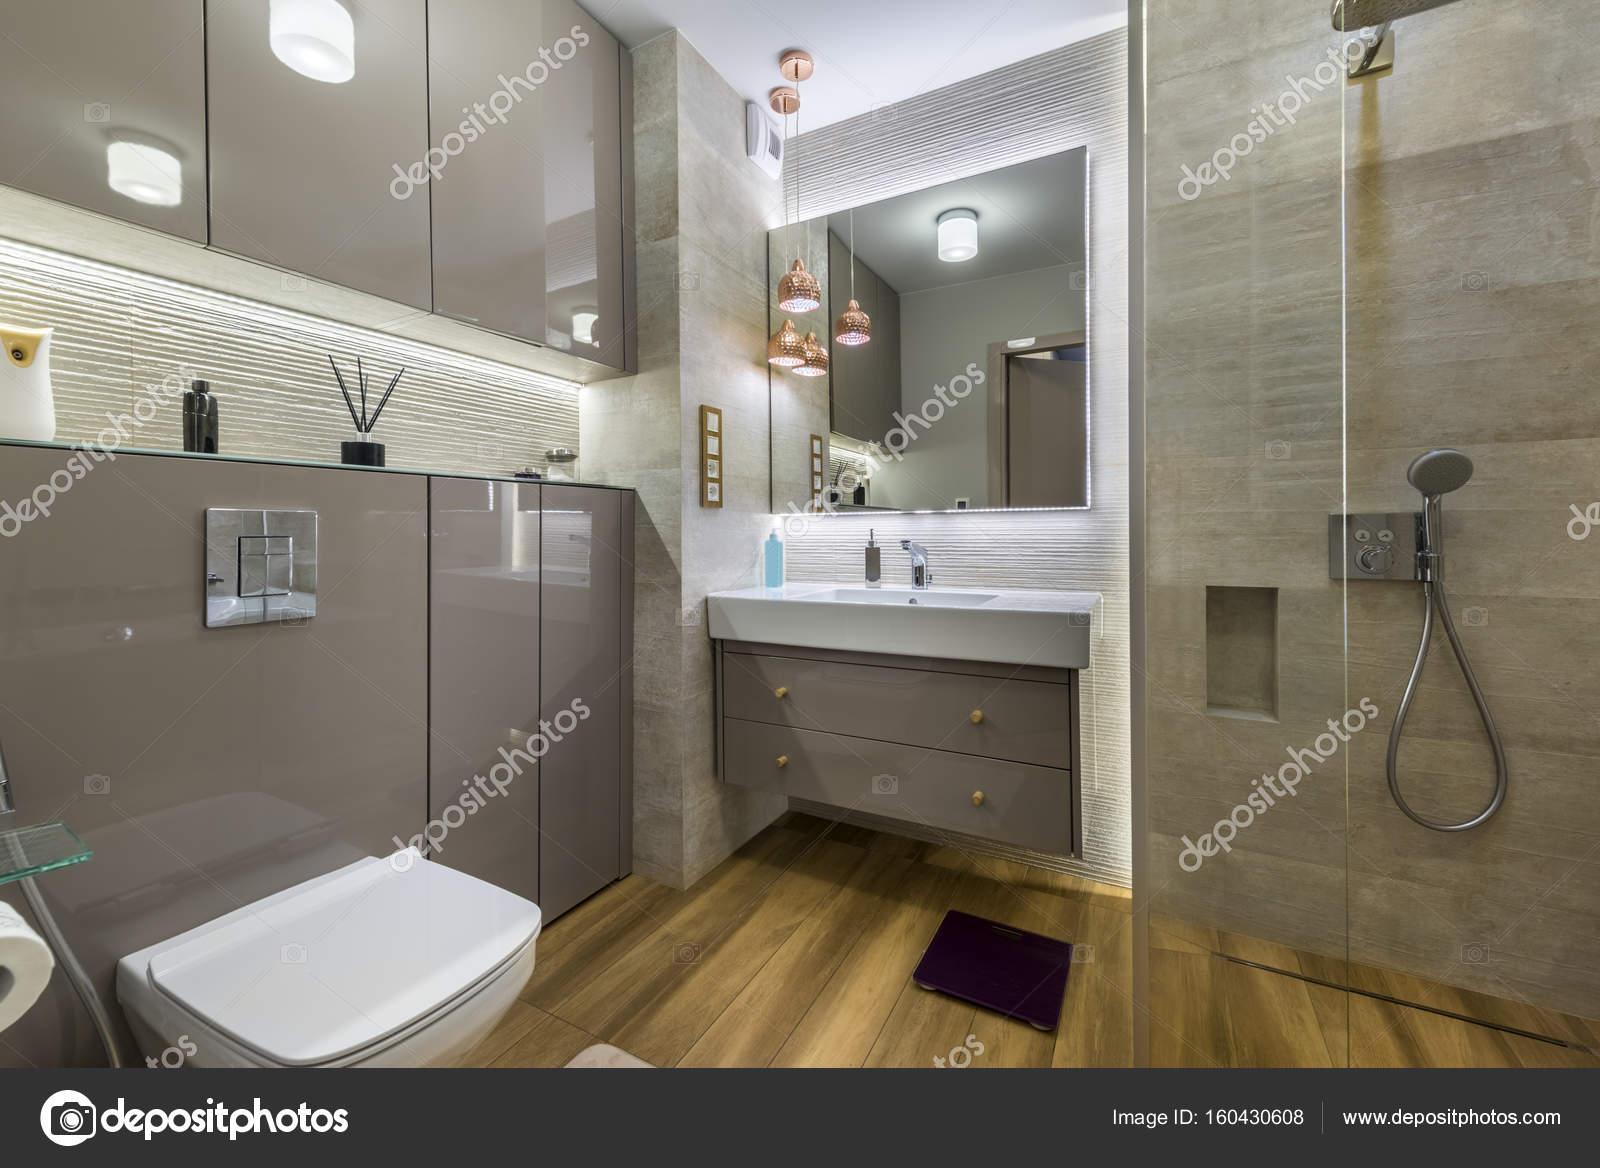 Moderne Badezimmer mit Holzboden — Stockfoto © jacek_kadaj #160430608